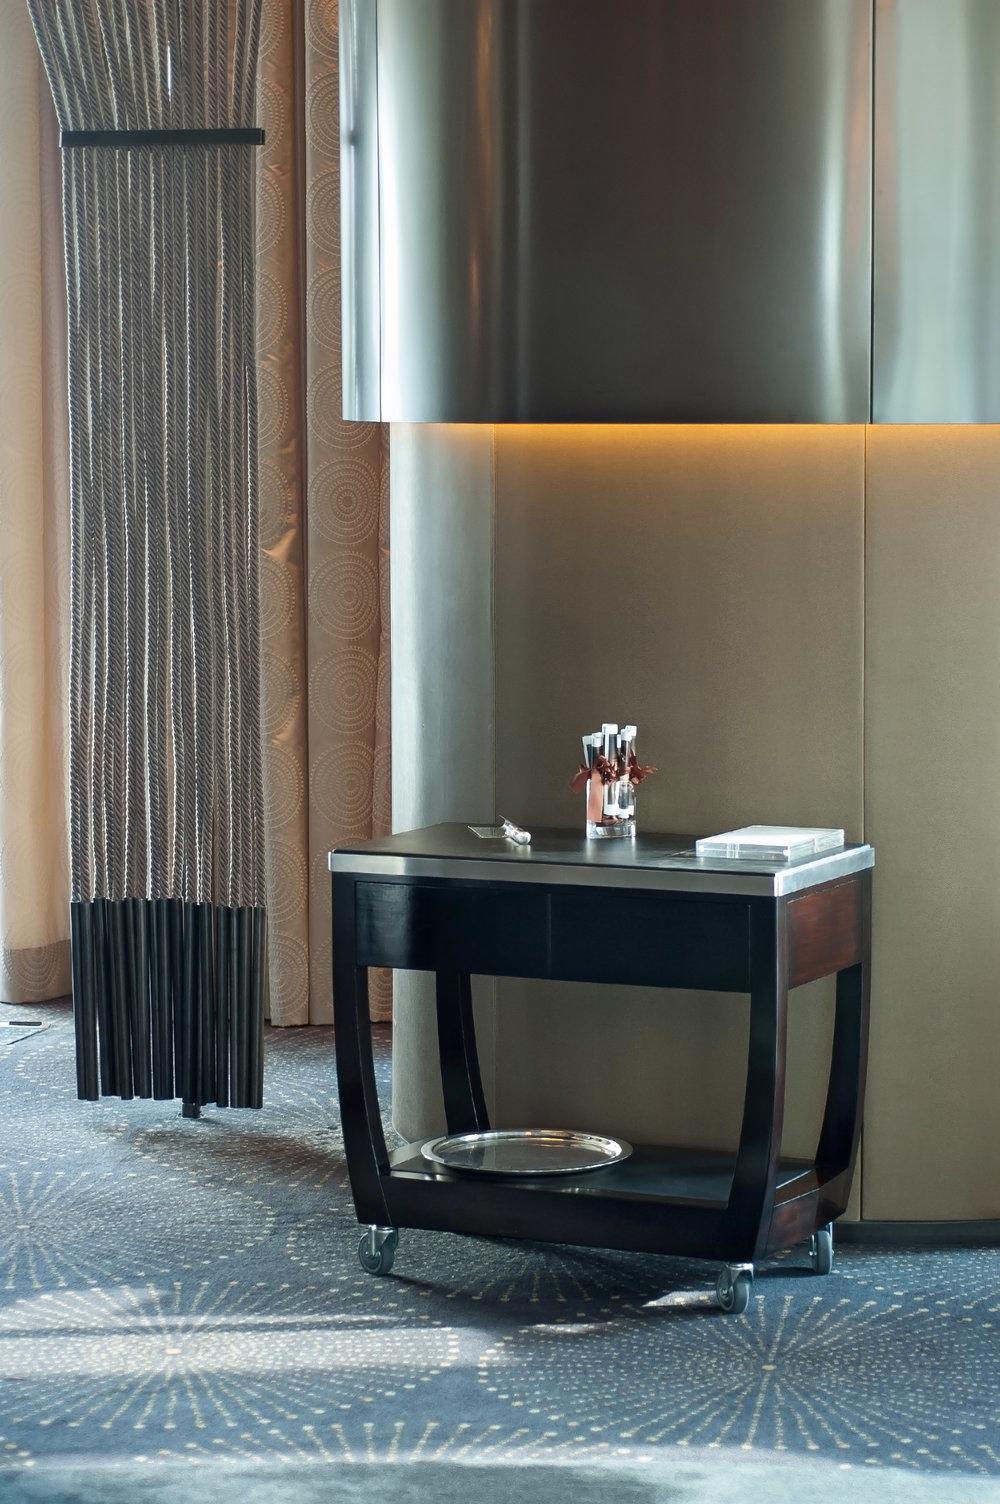 ....bespoke modern furniture | macau crown towers : service trolley (gueridon) ..特别定制现代家具 | 澳门皇冠度假酒店 : 服务车....